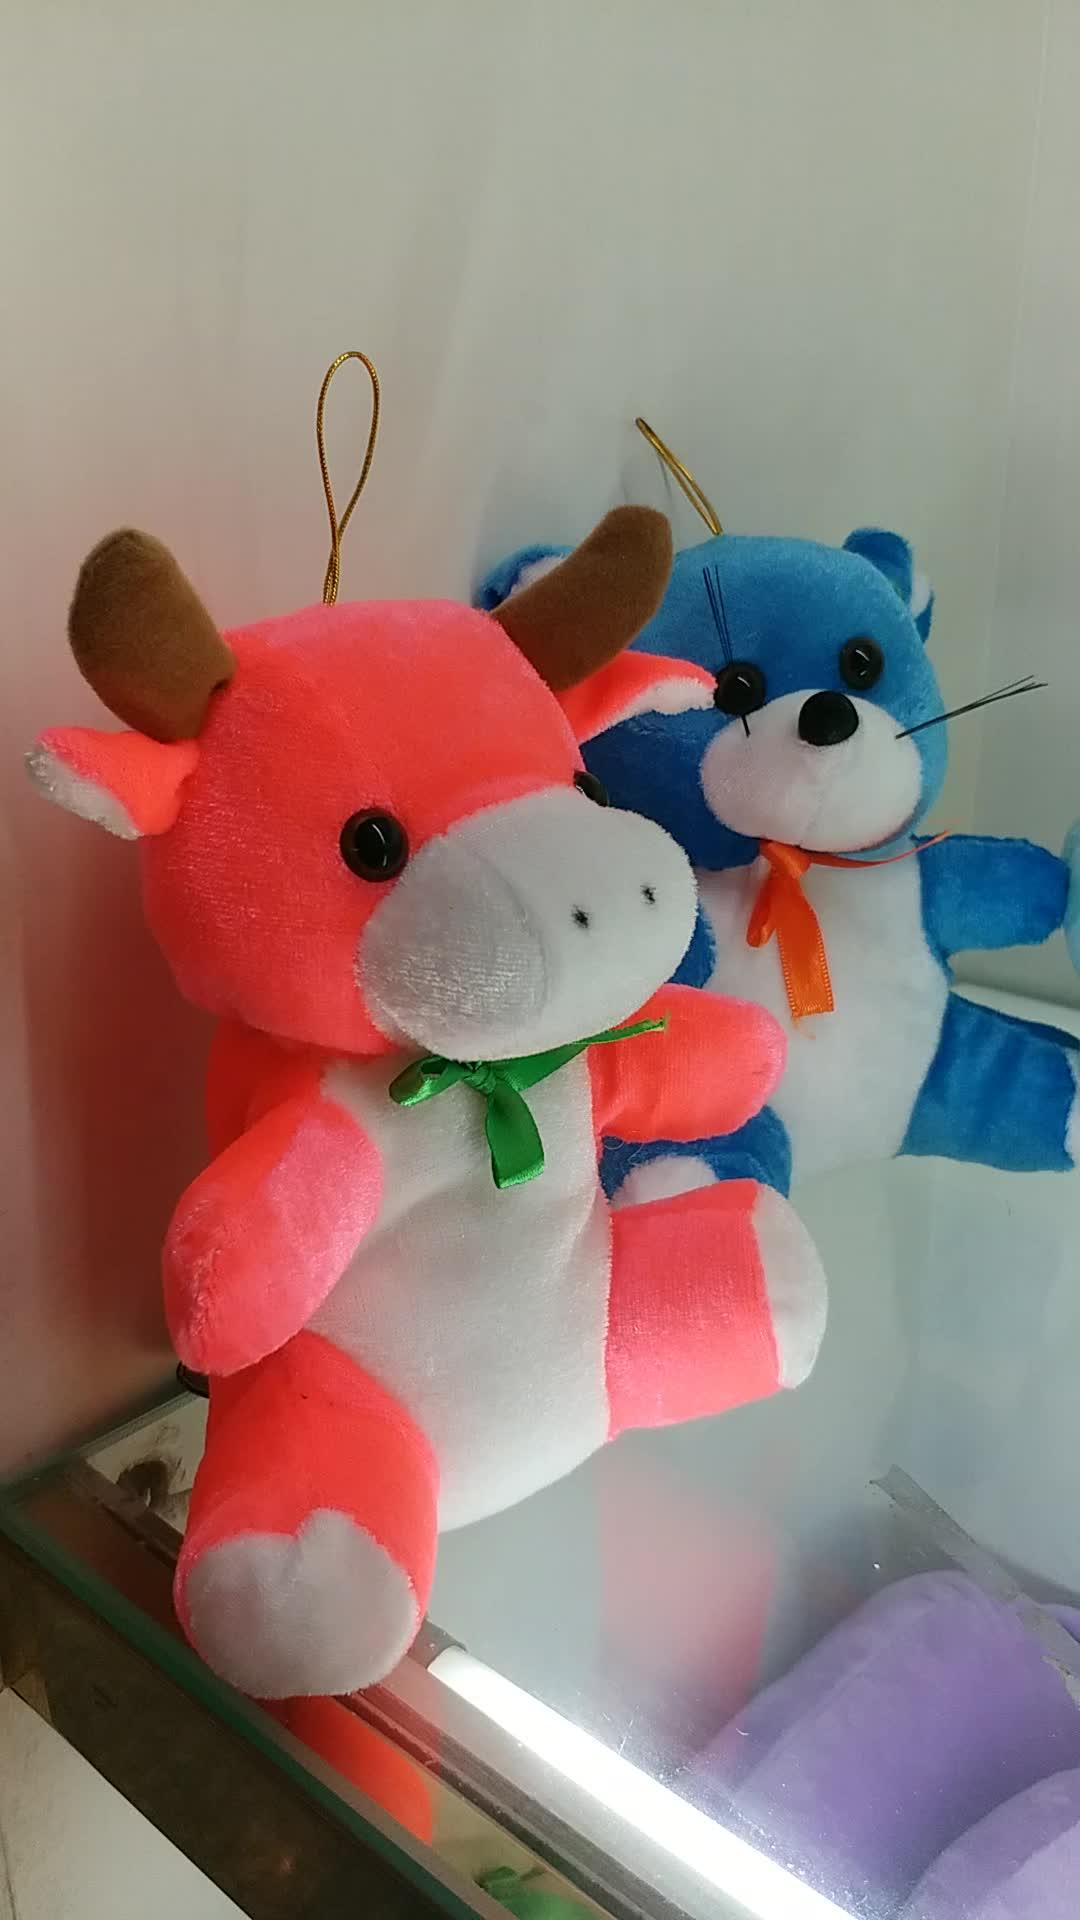 Plush Toys Product : Animal plush toys stuffed toy for crane machine